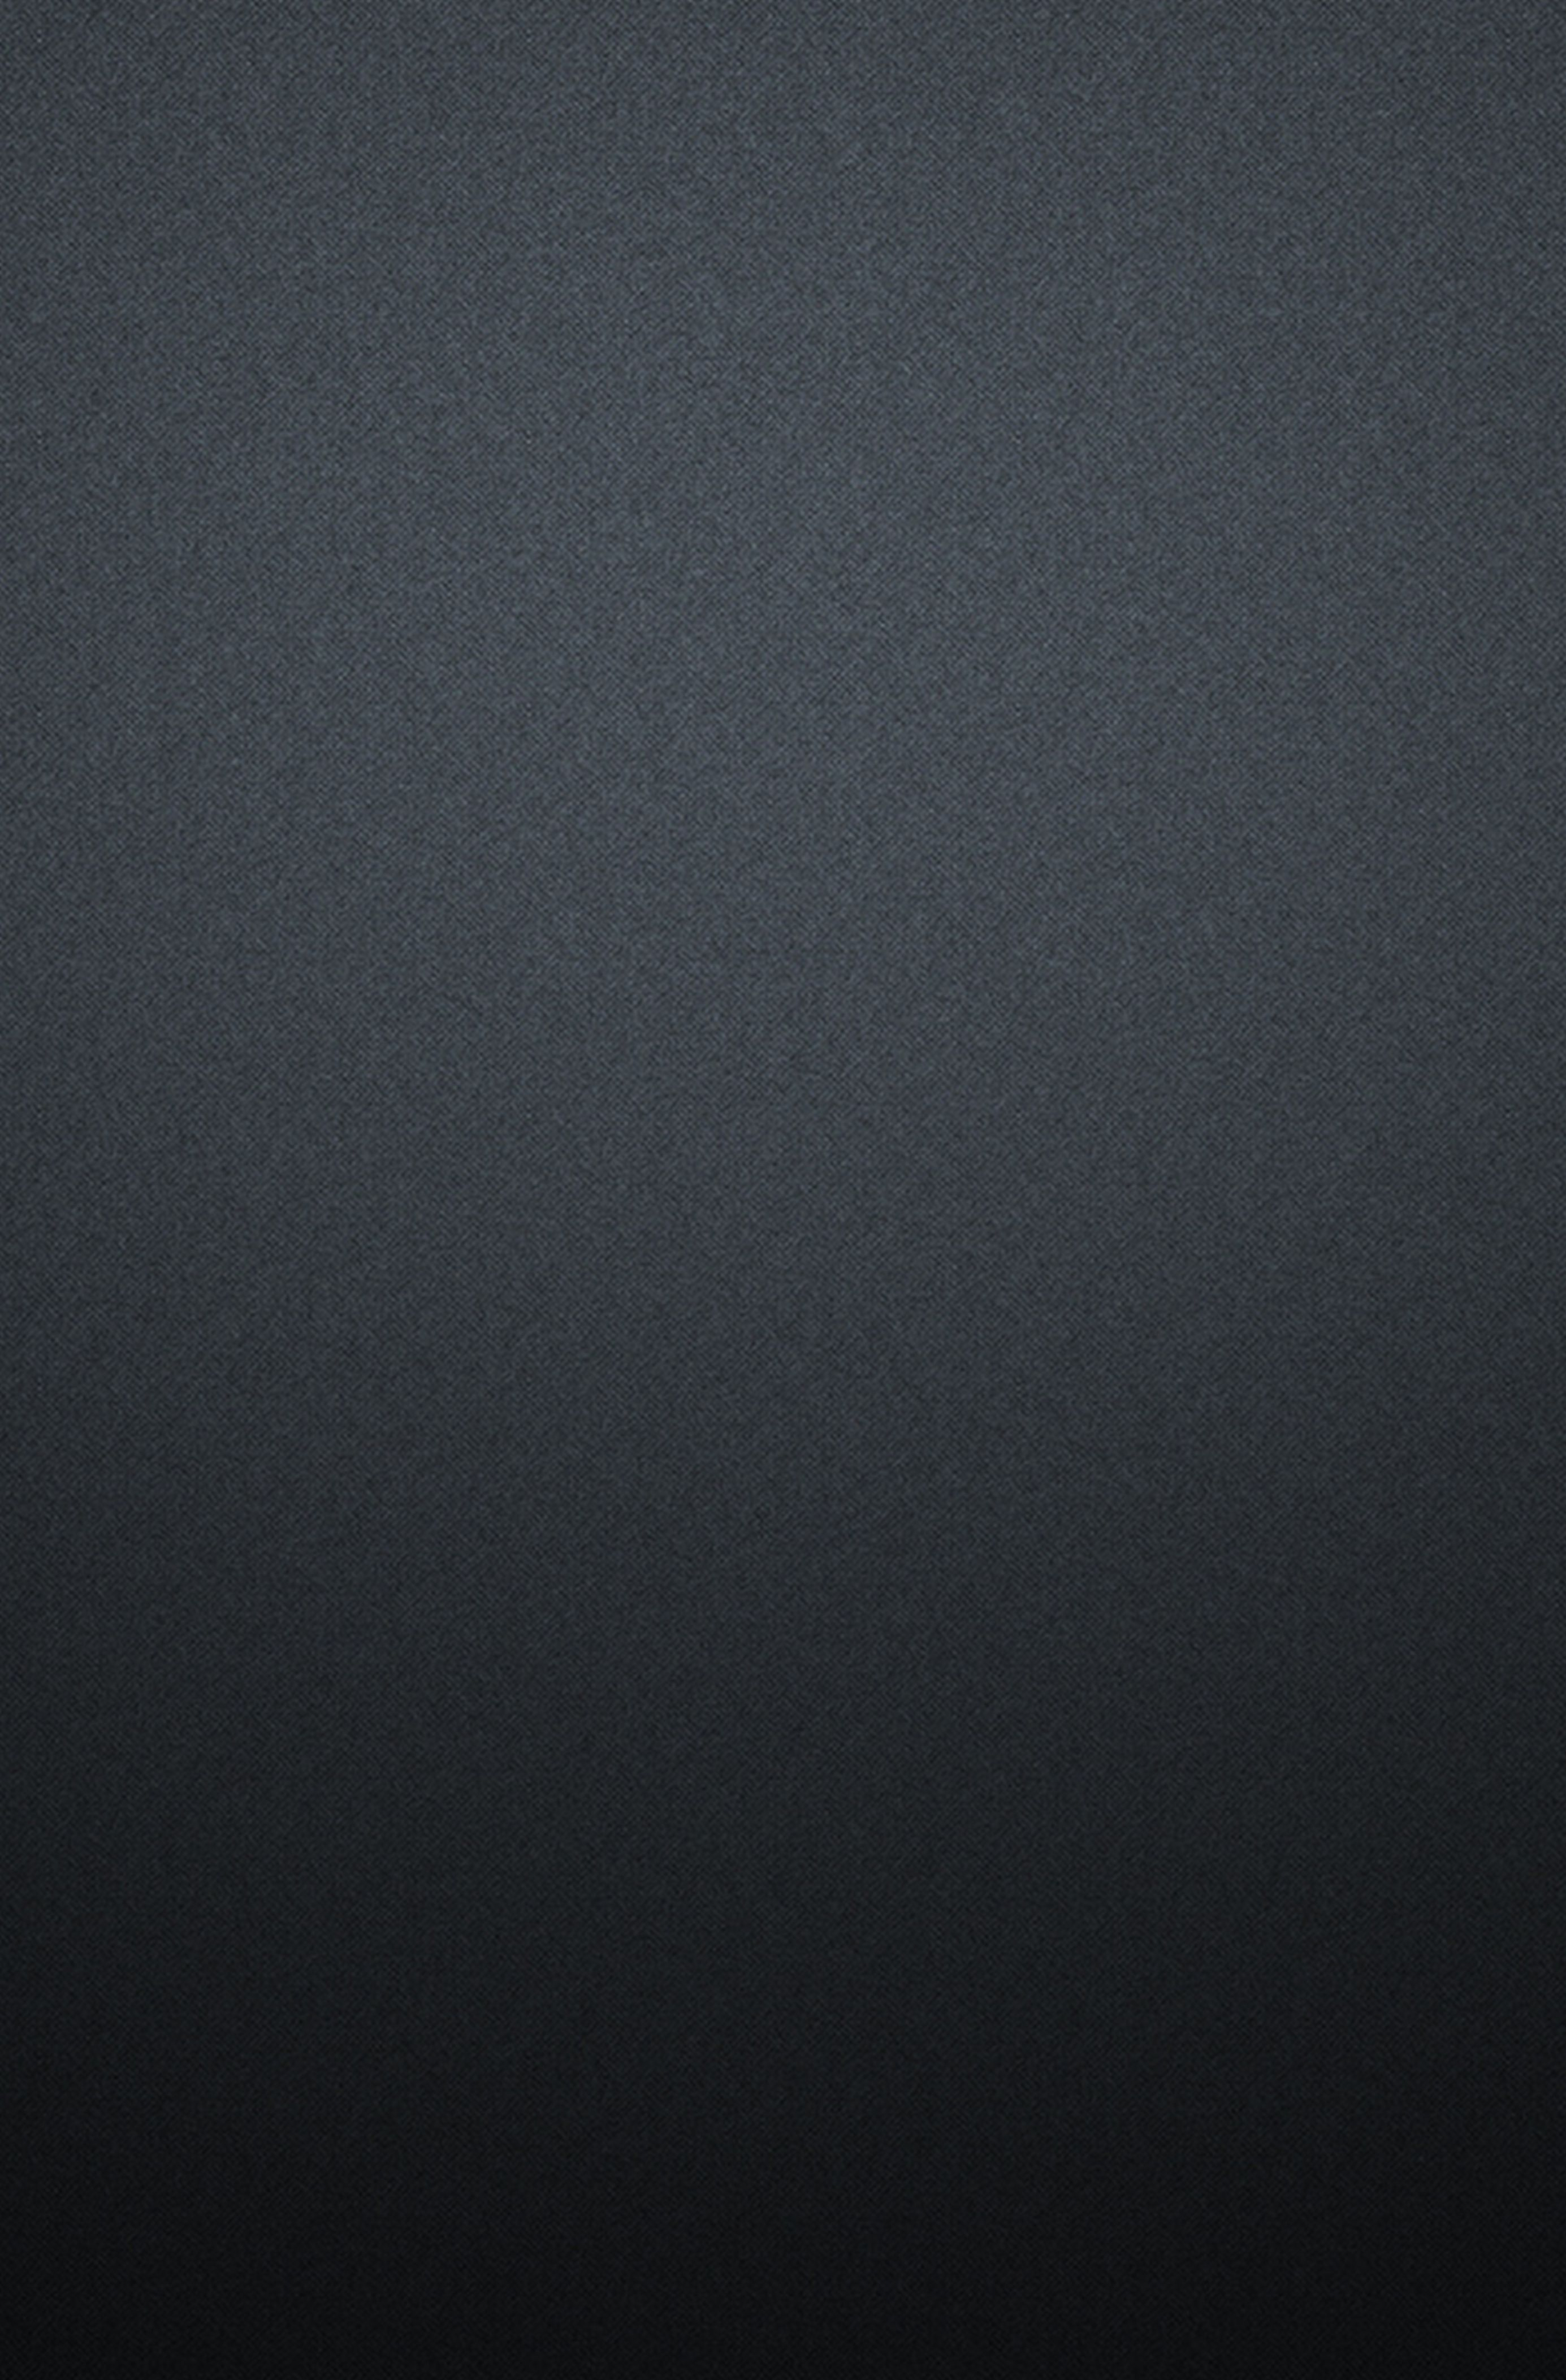 Matt Black Gradient Background Material in 2020 Grey